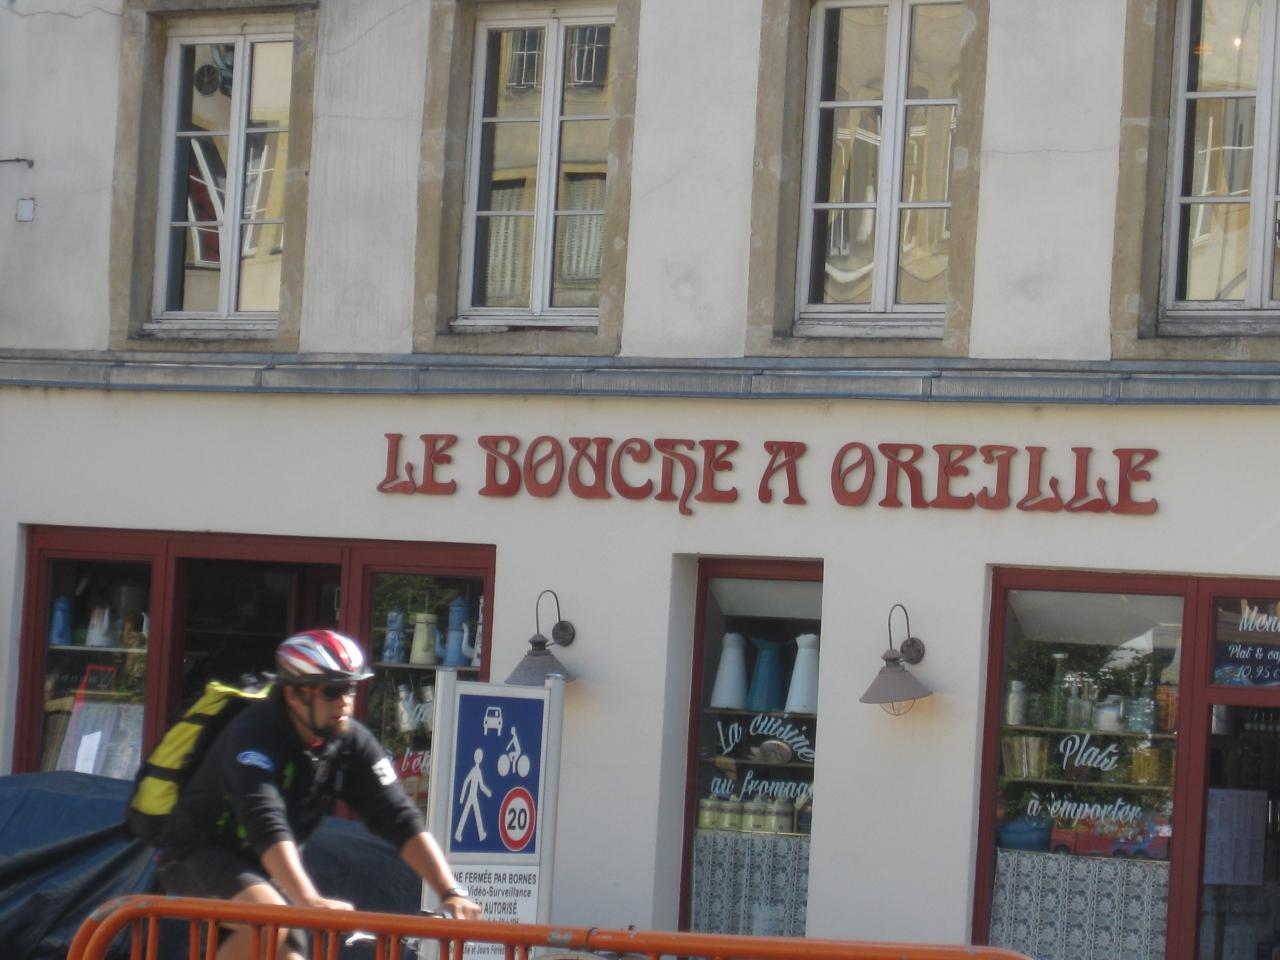 RESTAURANT LE BOUCHE A OREILLE A METZ